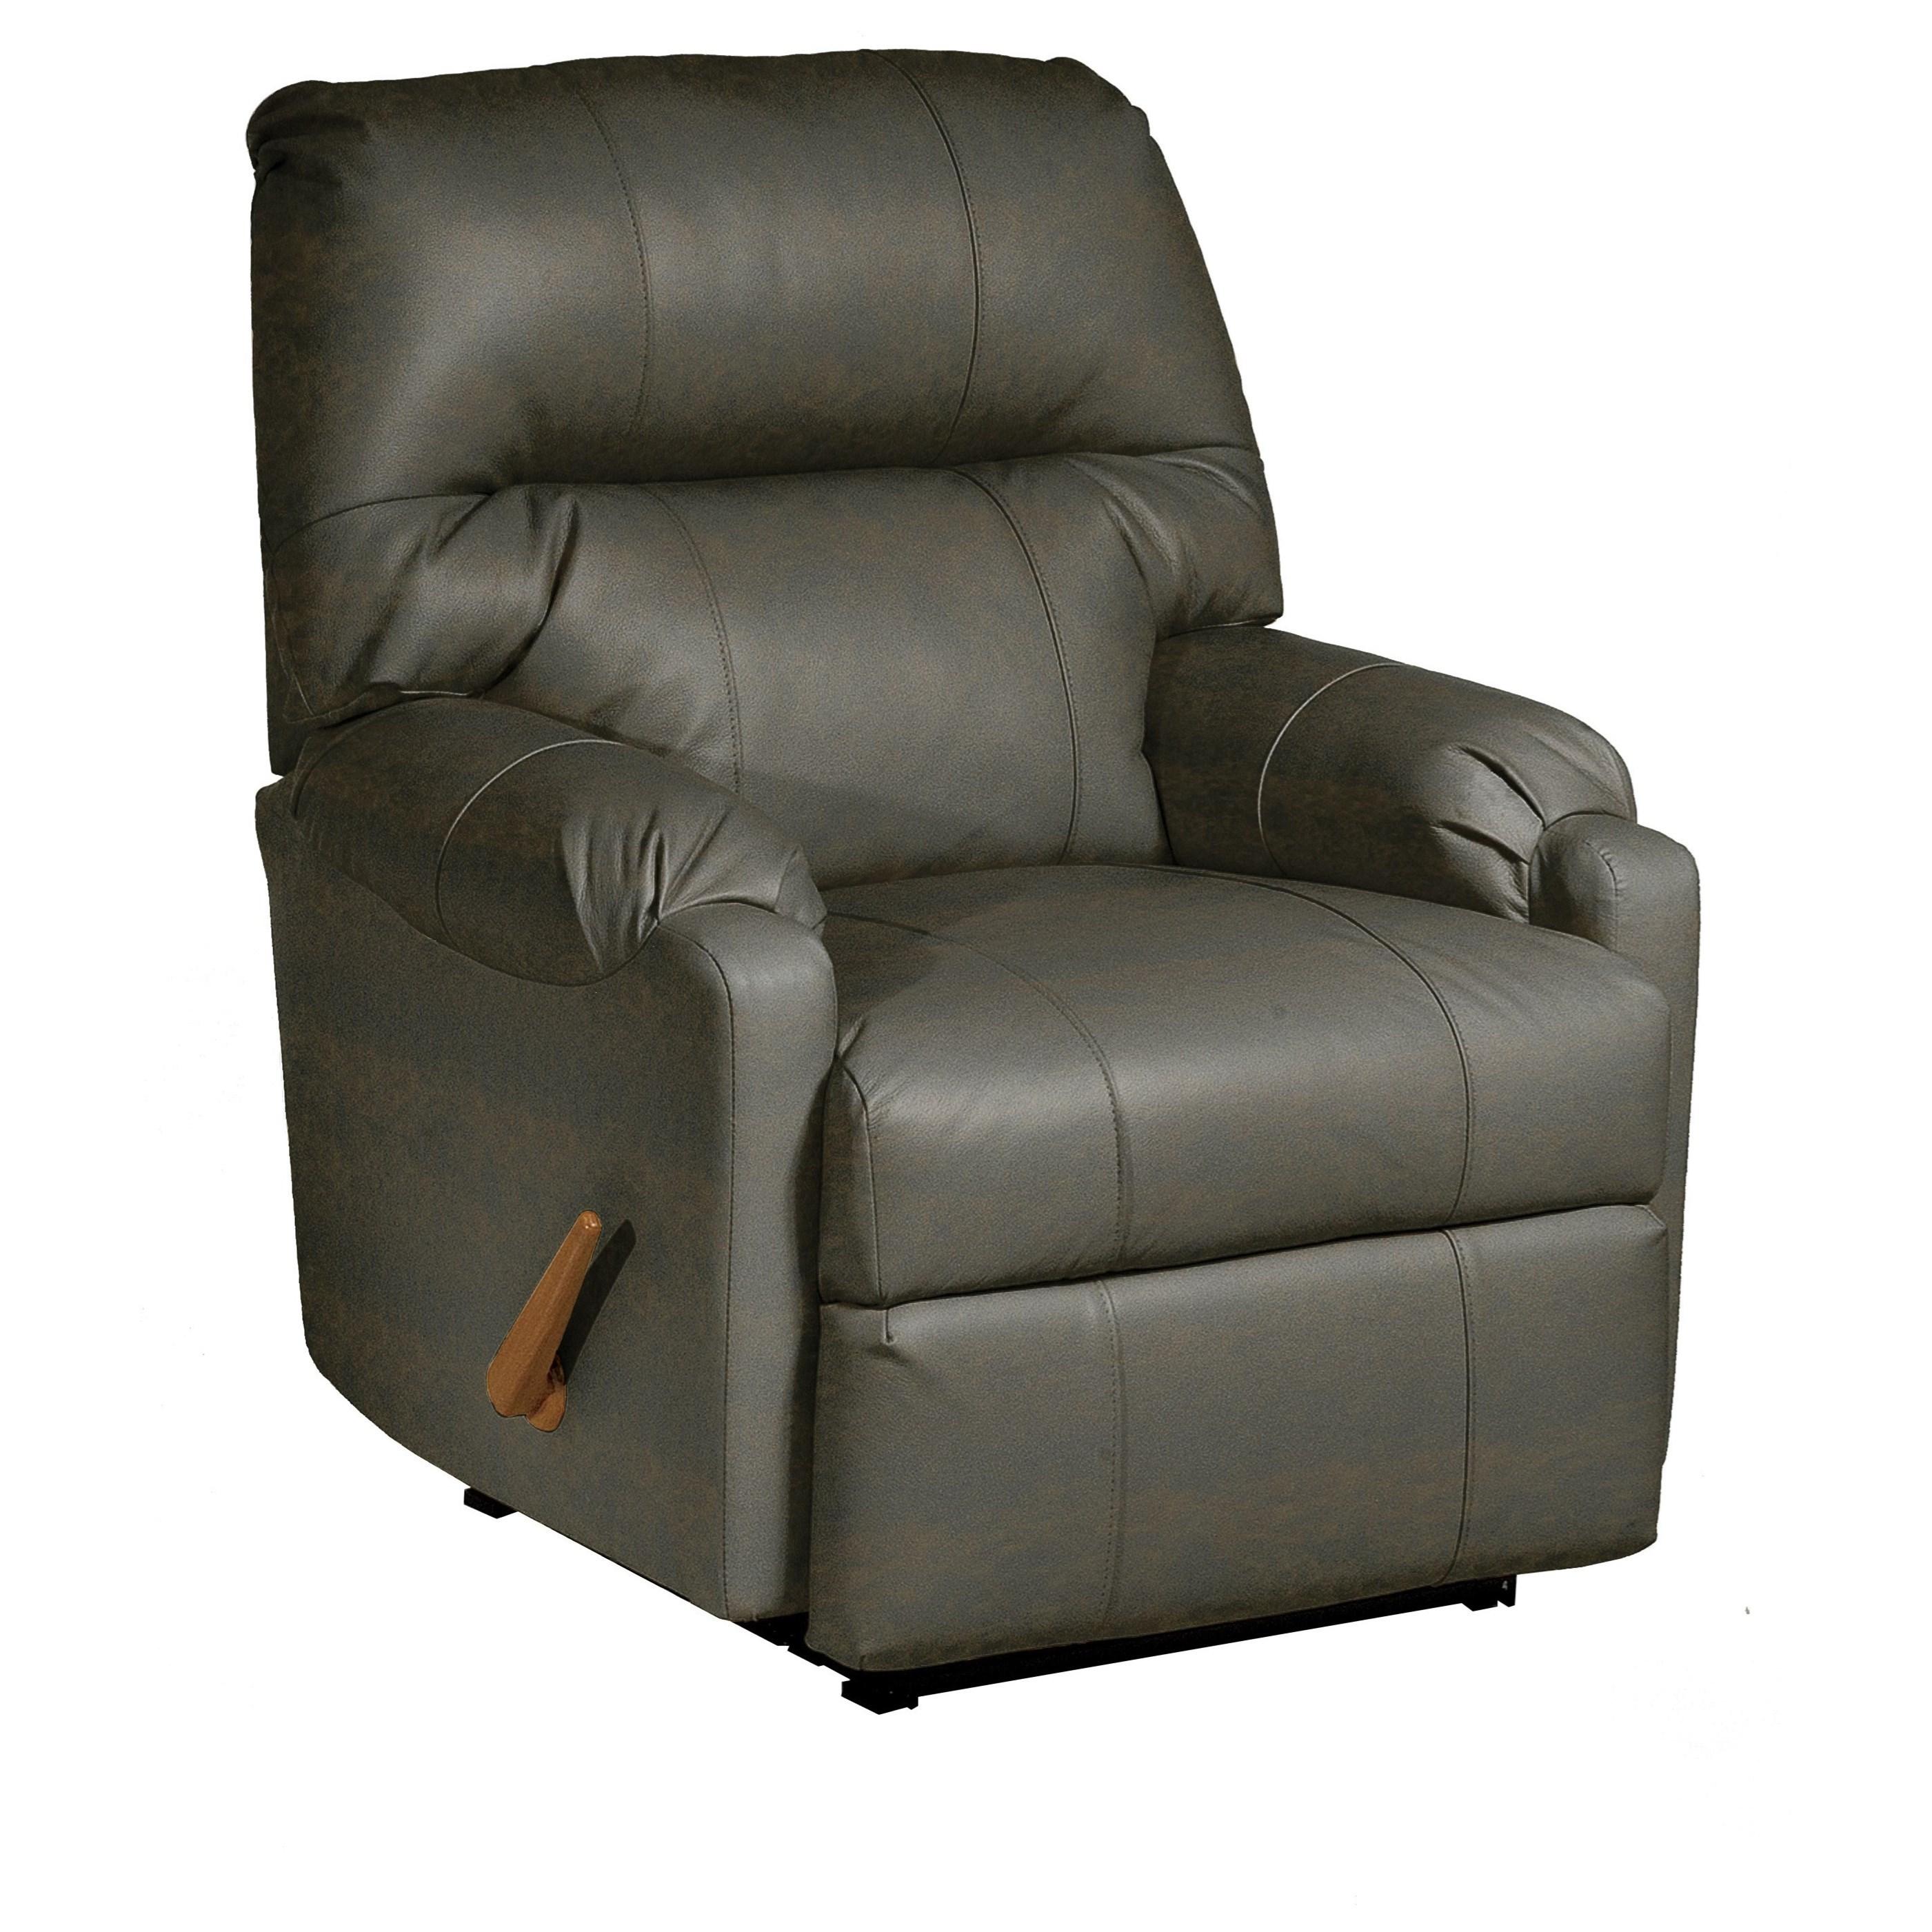 Best Home Furnishings JoJo Wallhugger Recliner - Item Number: -1794850838-24783U